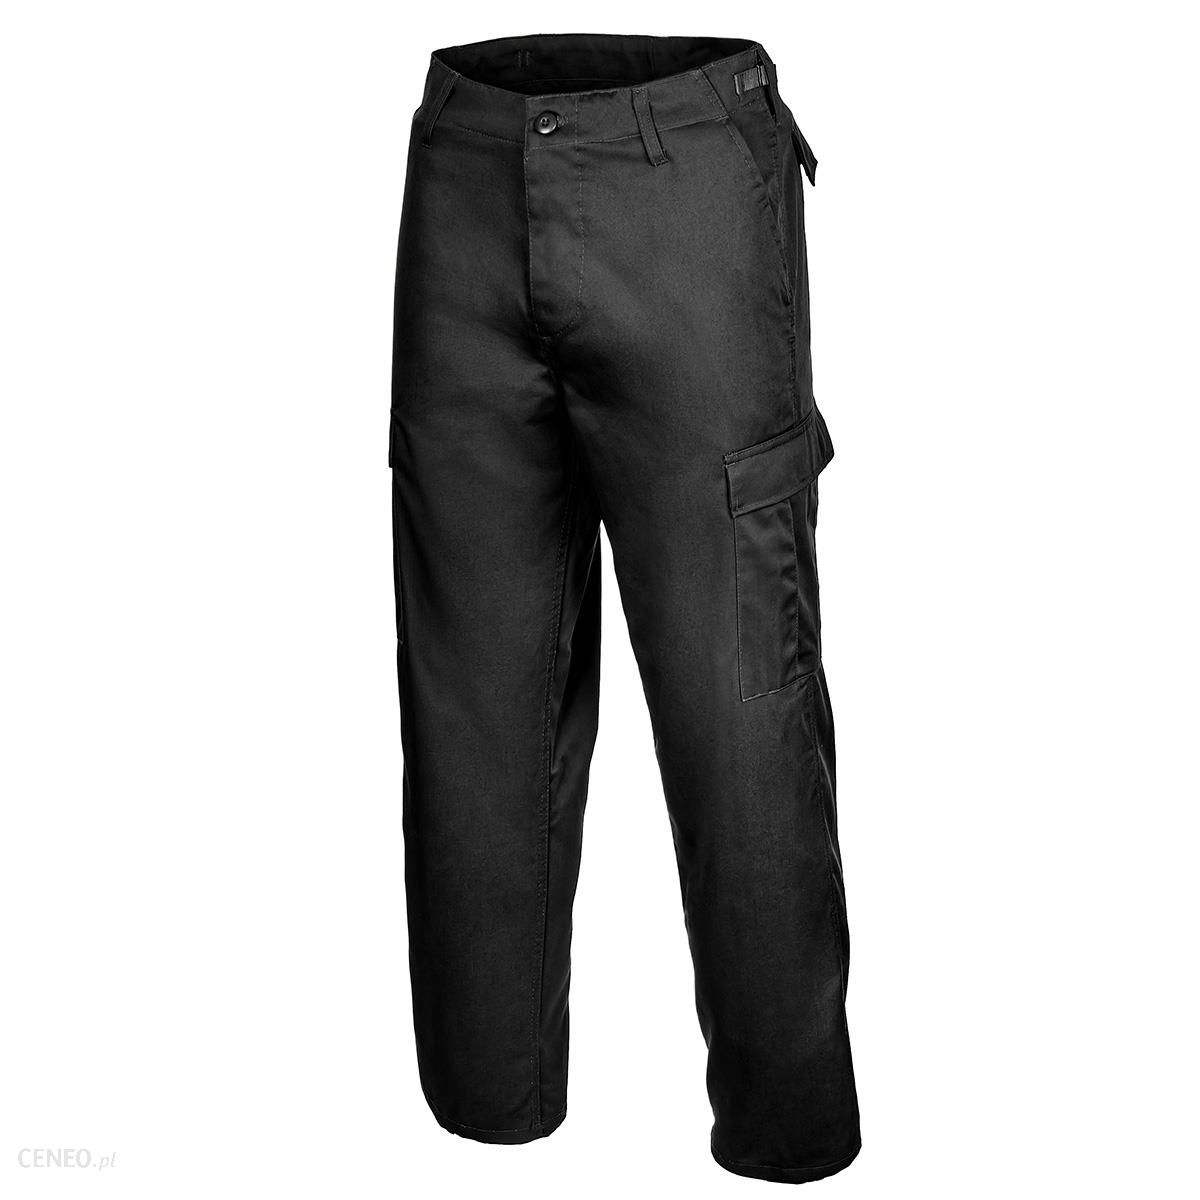 Mil-Tec Spodnie Us Ranger Bdu Black (11810002)